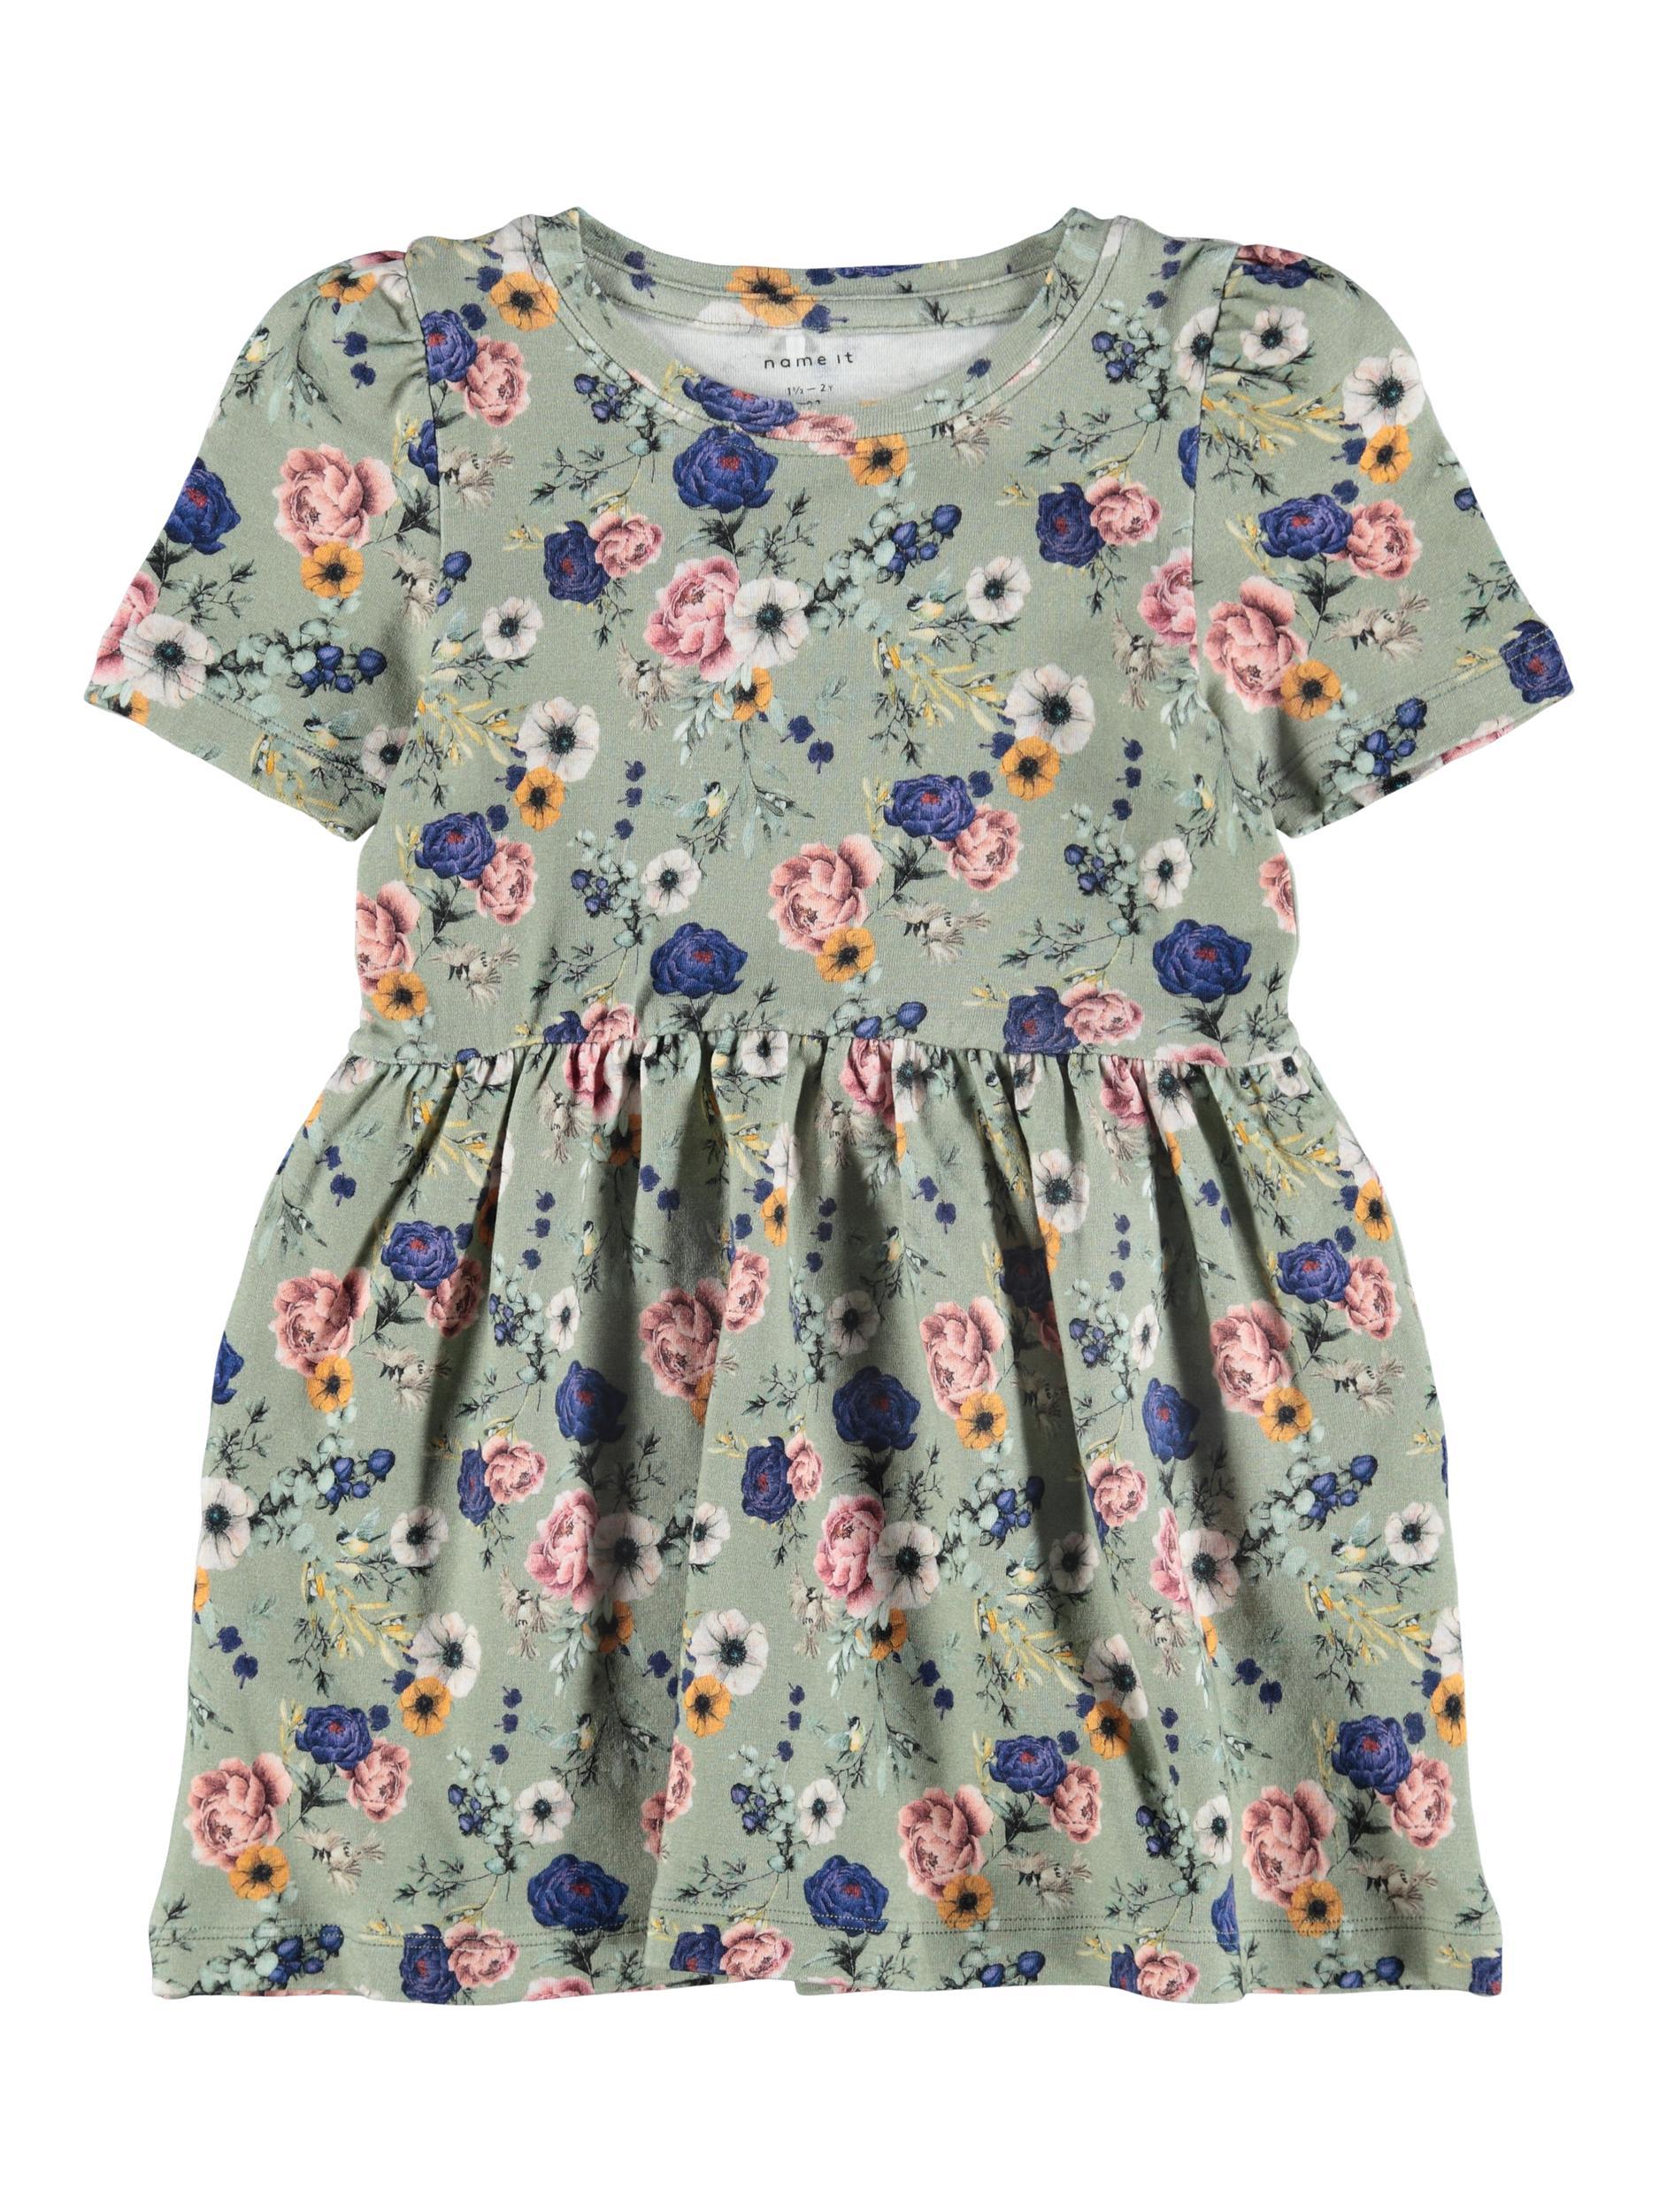 Name It Josse kjole, desert sage, 92